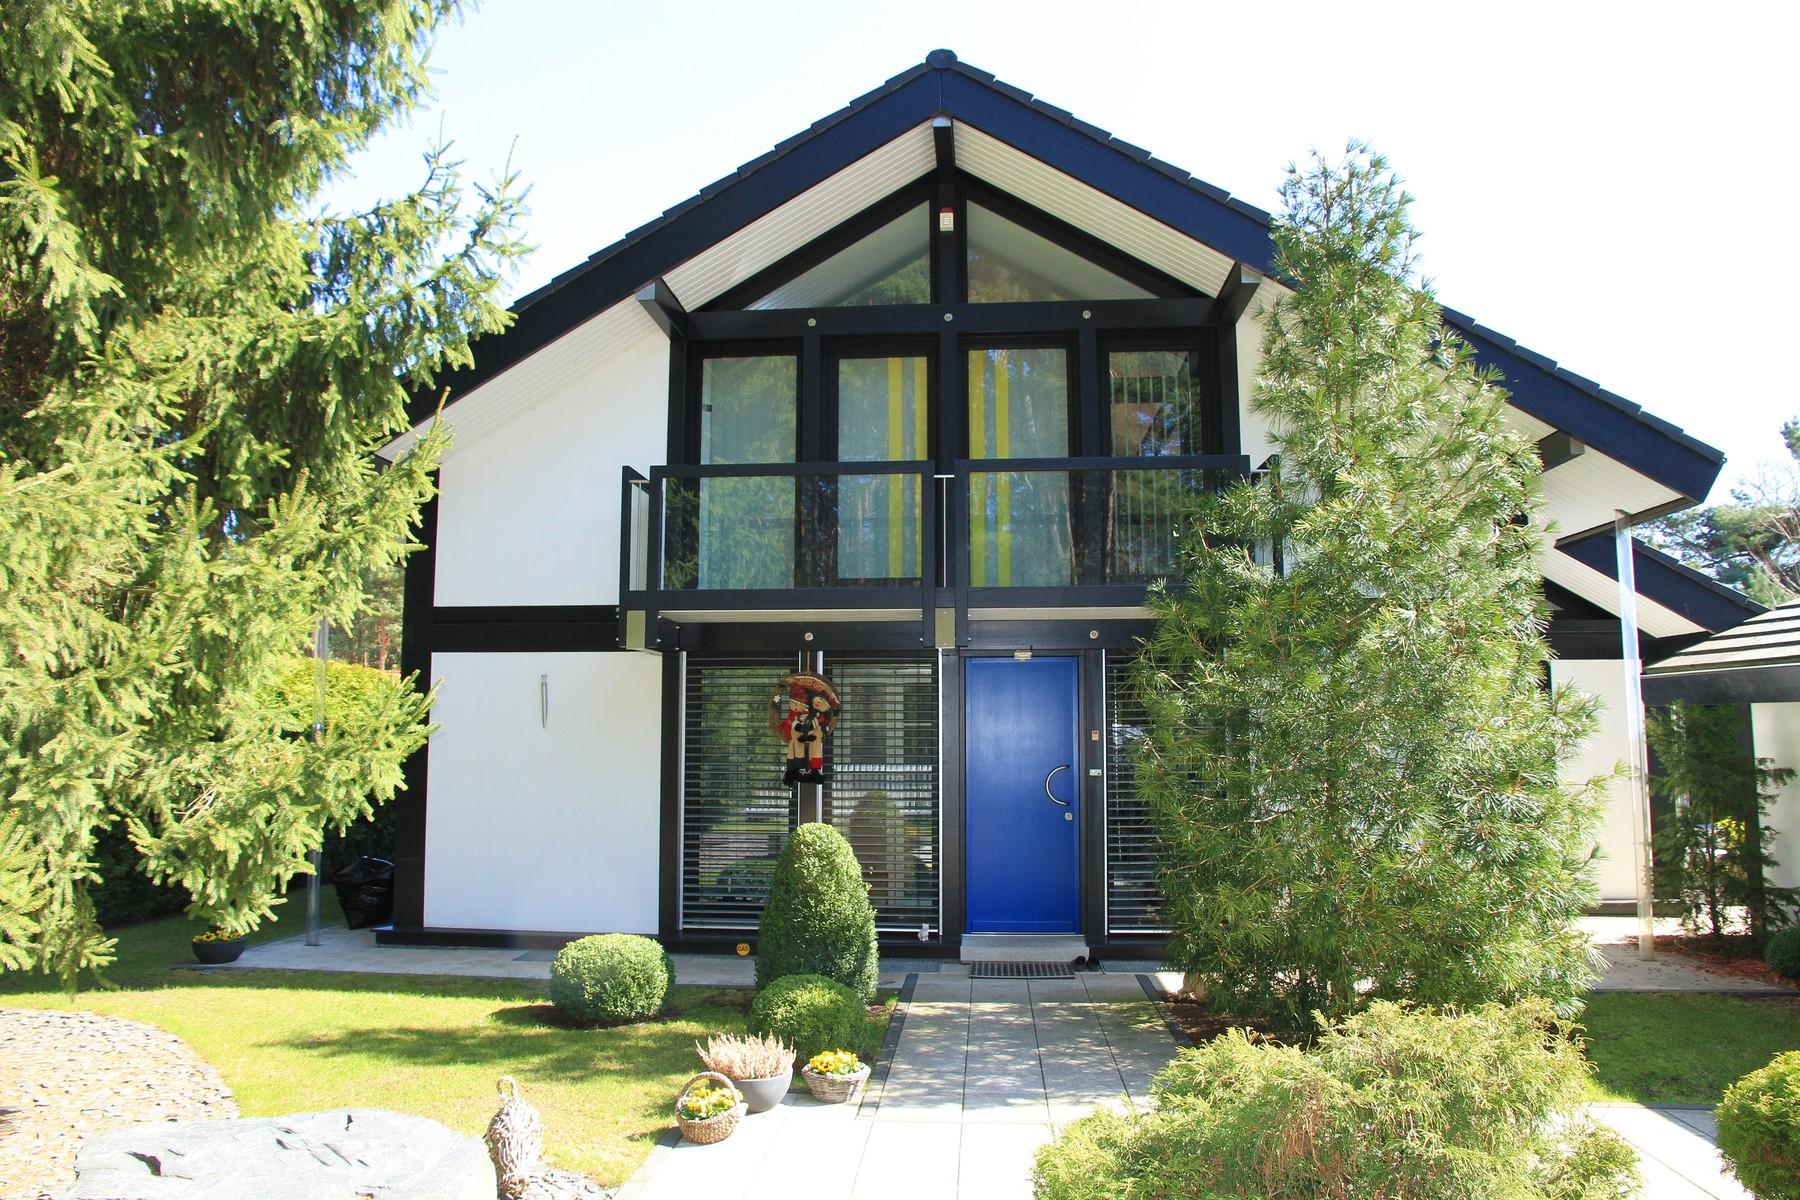 fachwerkhaus dunkle konstruktion holz skelett haus landhaus 1 concentus moderne fachwerkh user. Black Bedroom Furniture Sets. Home Design Ideas